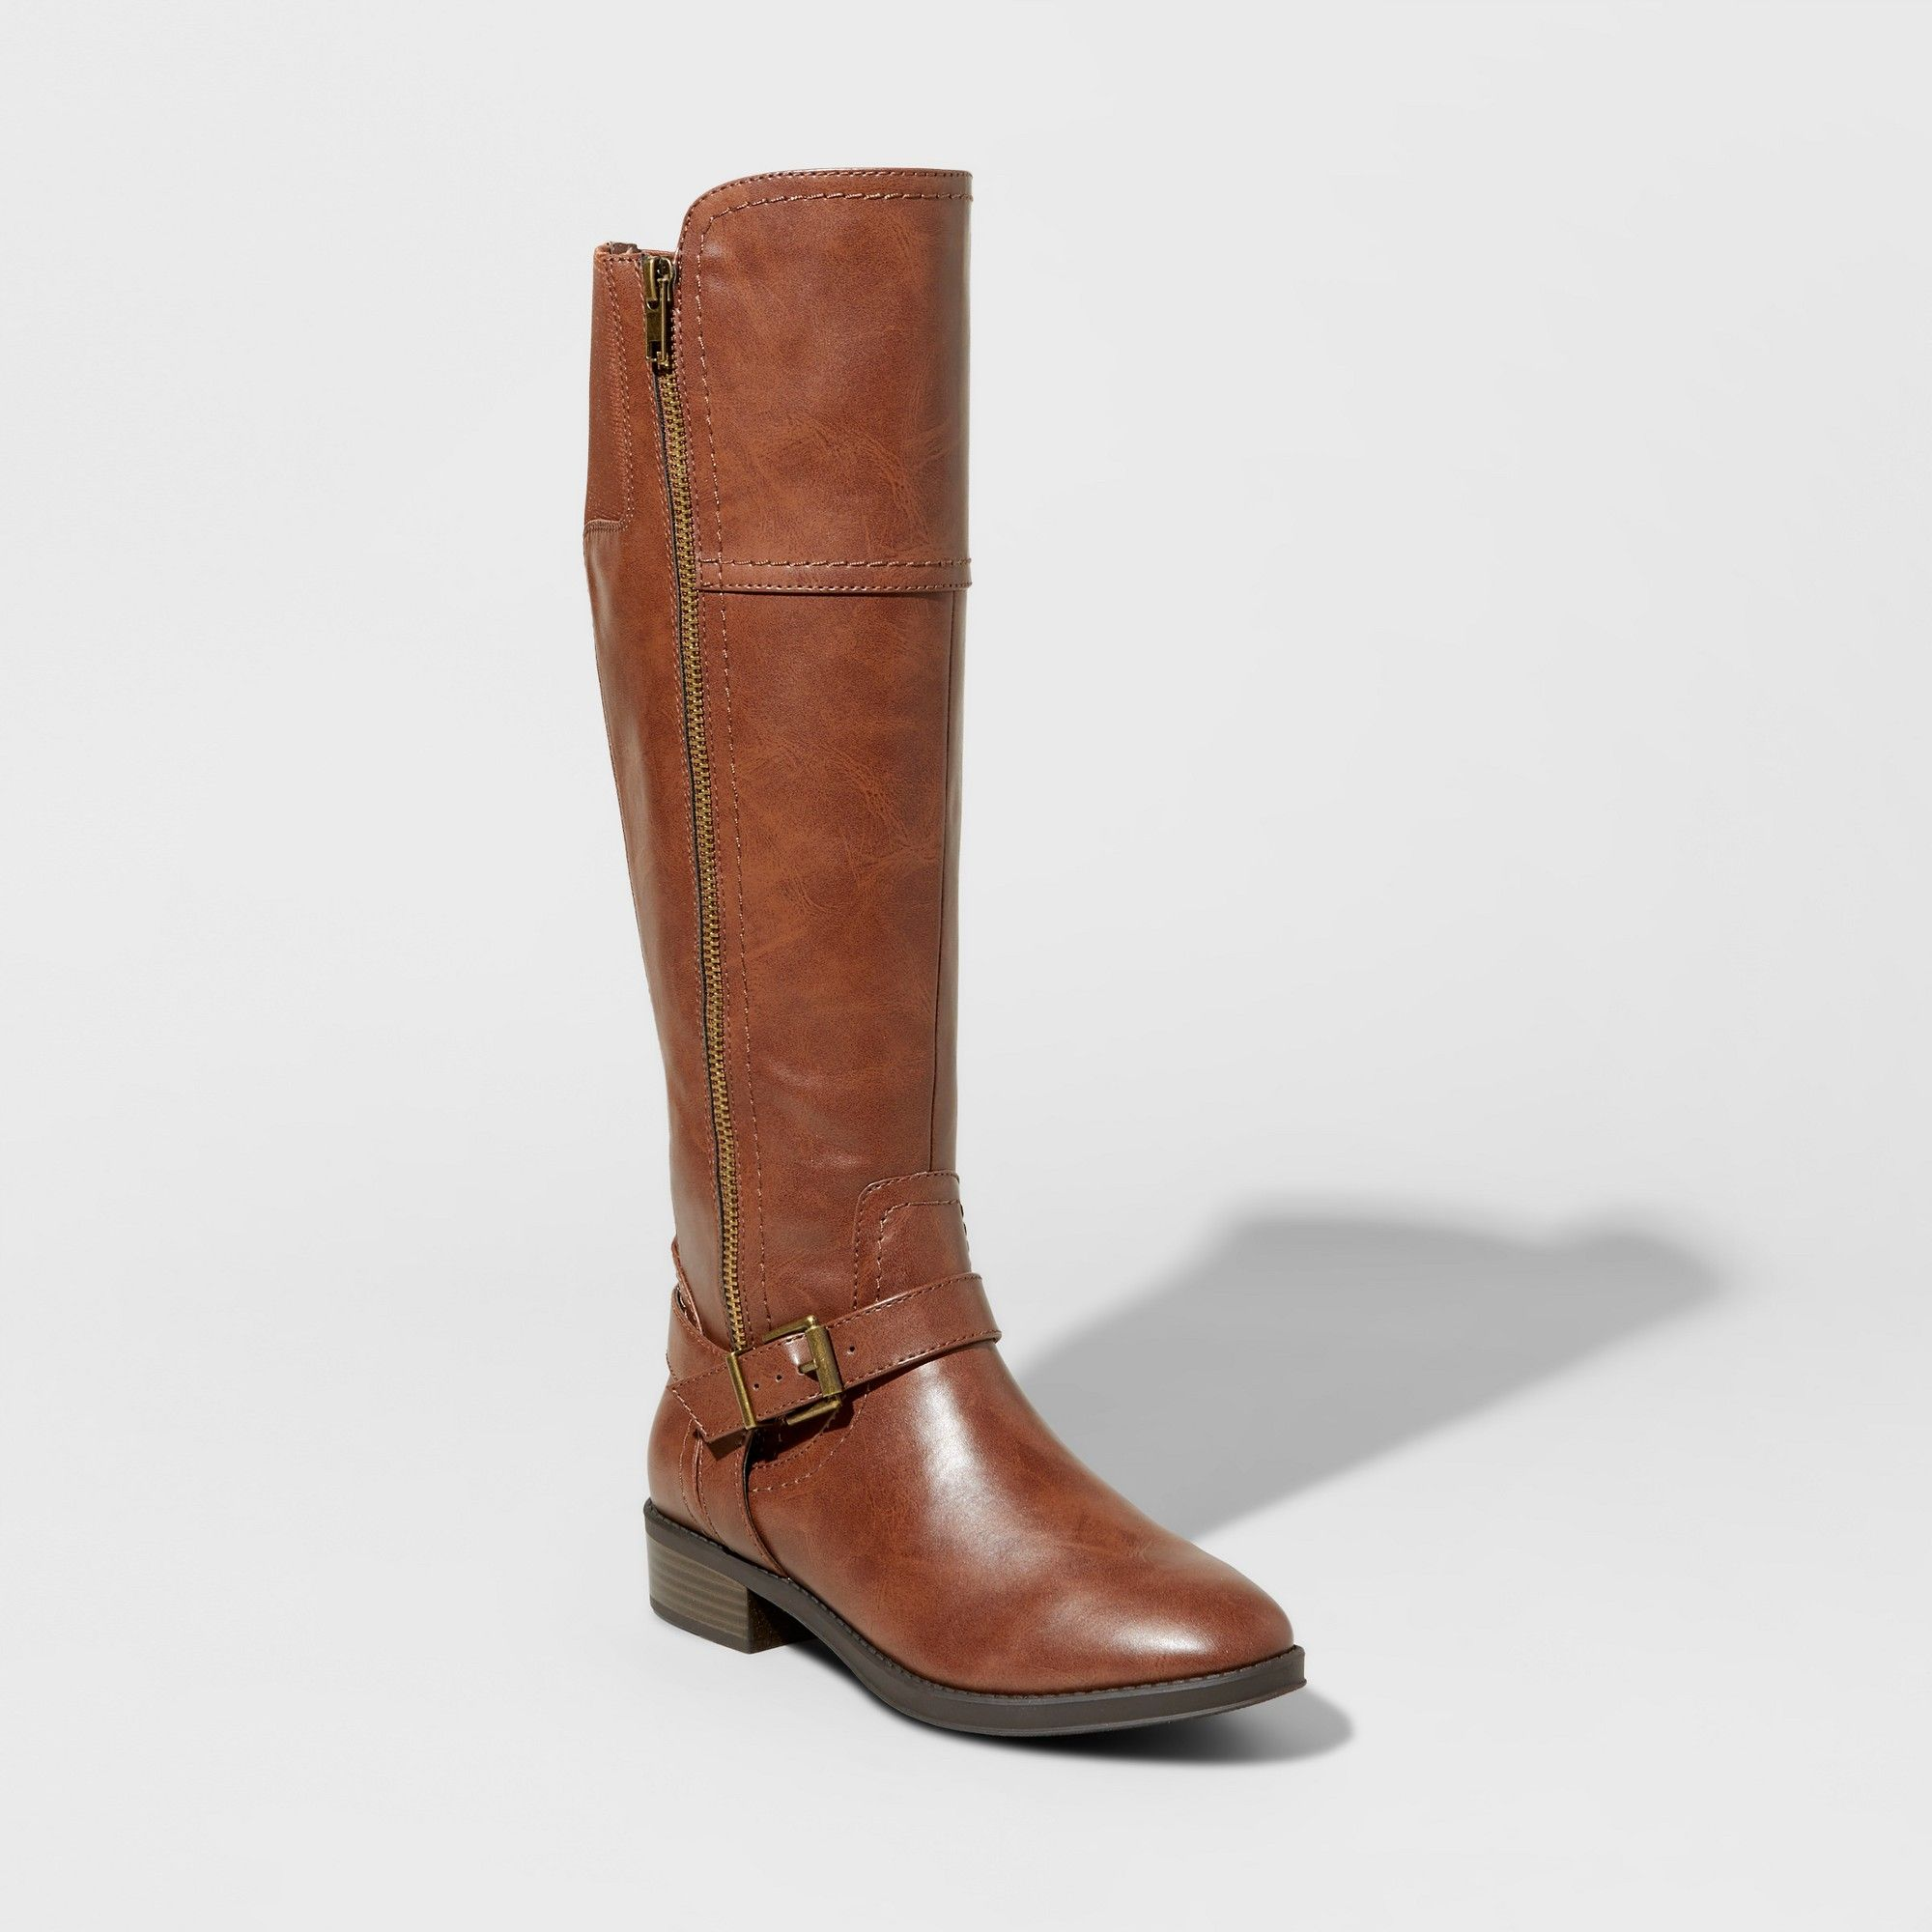 Women's Adaline Tall Riding Boots - Merona Brown 7.5